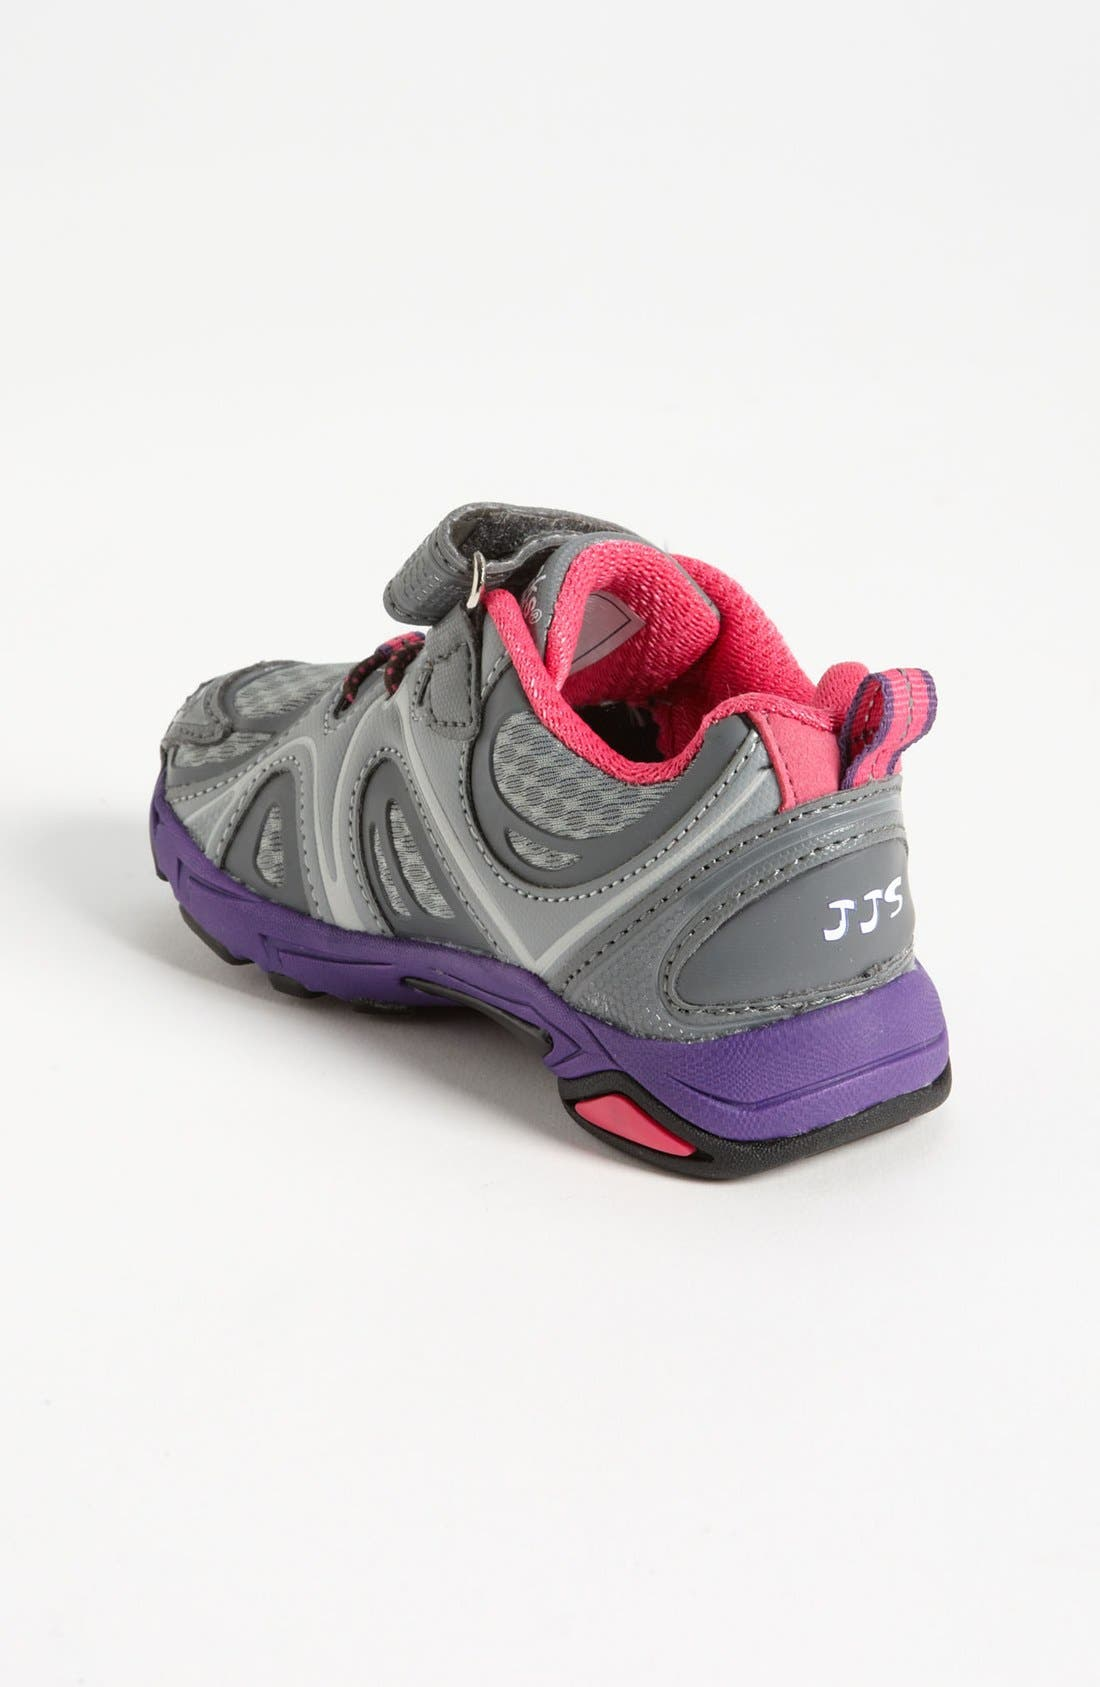 Alternate Image 2  - Jumping Jacks 'Titan' Sneaker (Walker, Toddler, Little Kid & Big Kid)